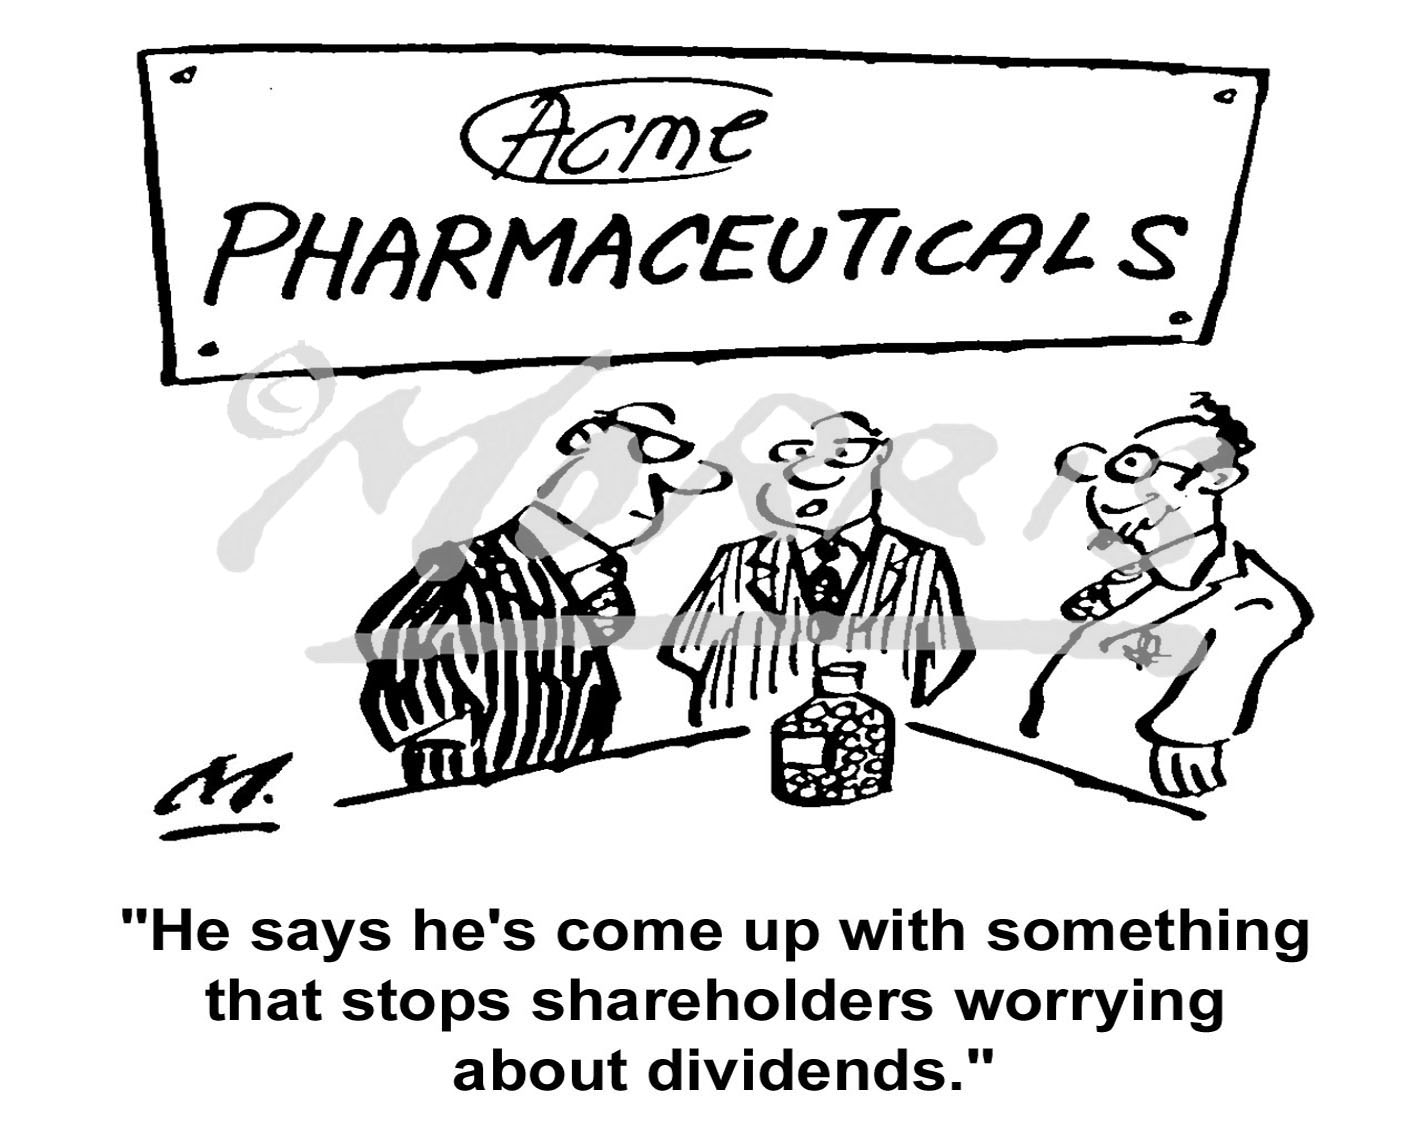 Heath care and stock market investors cartoon Ref: 1760bw